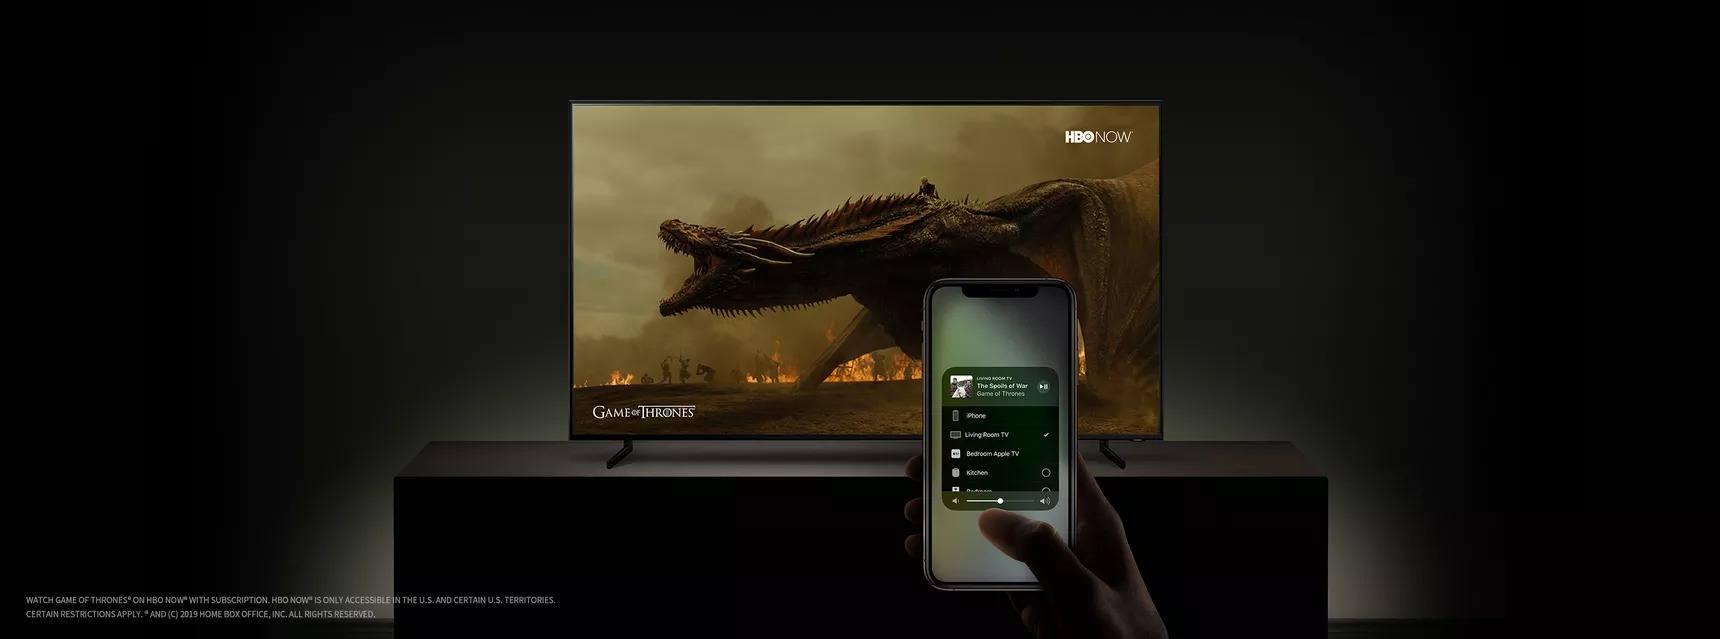 airplay 2 samsung smart tv